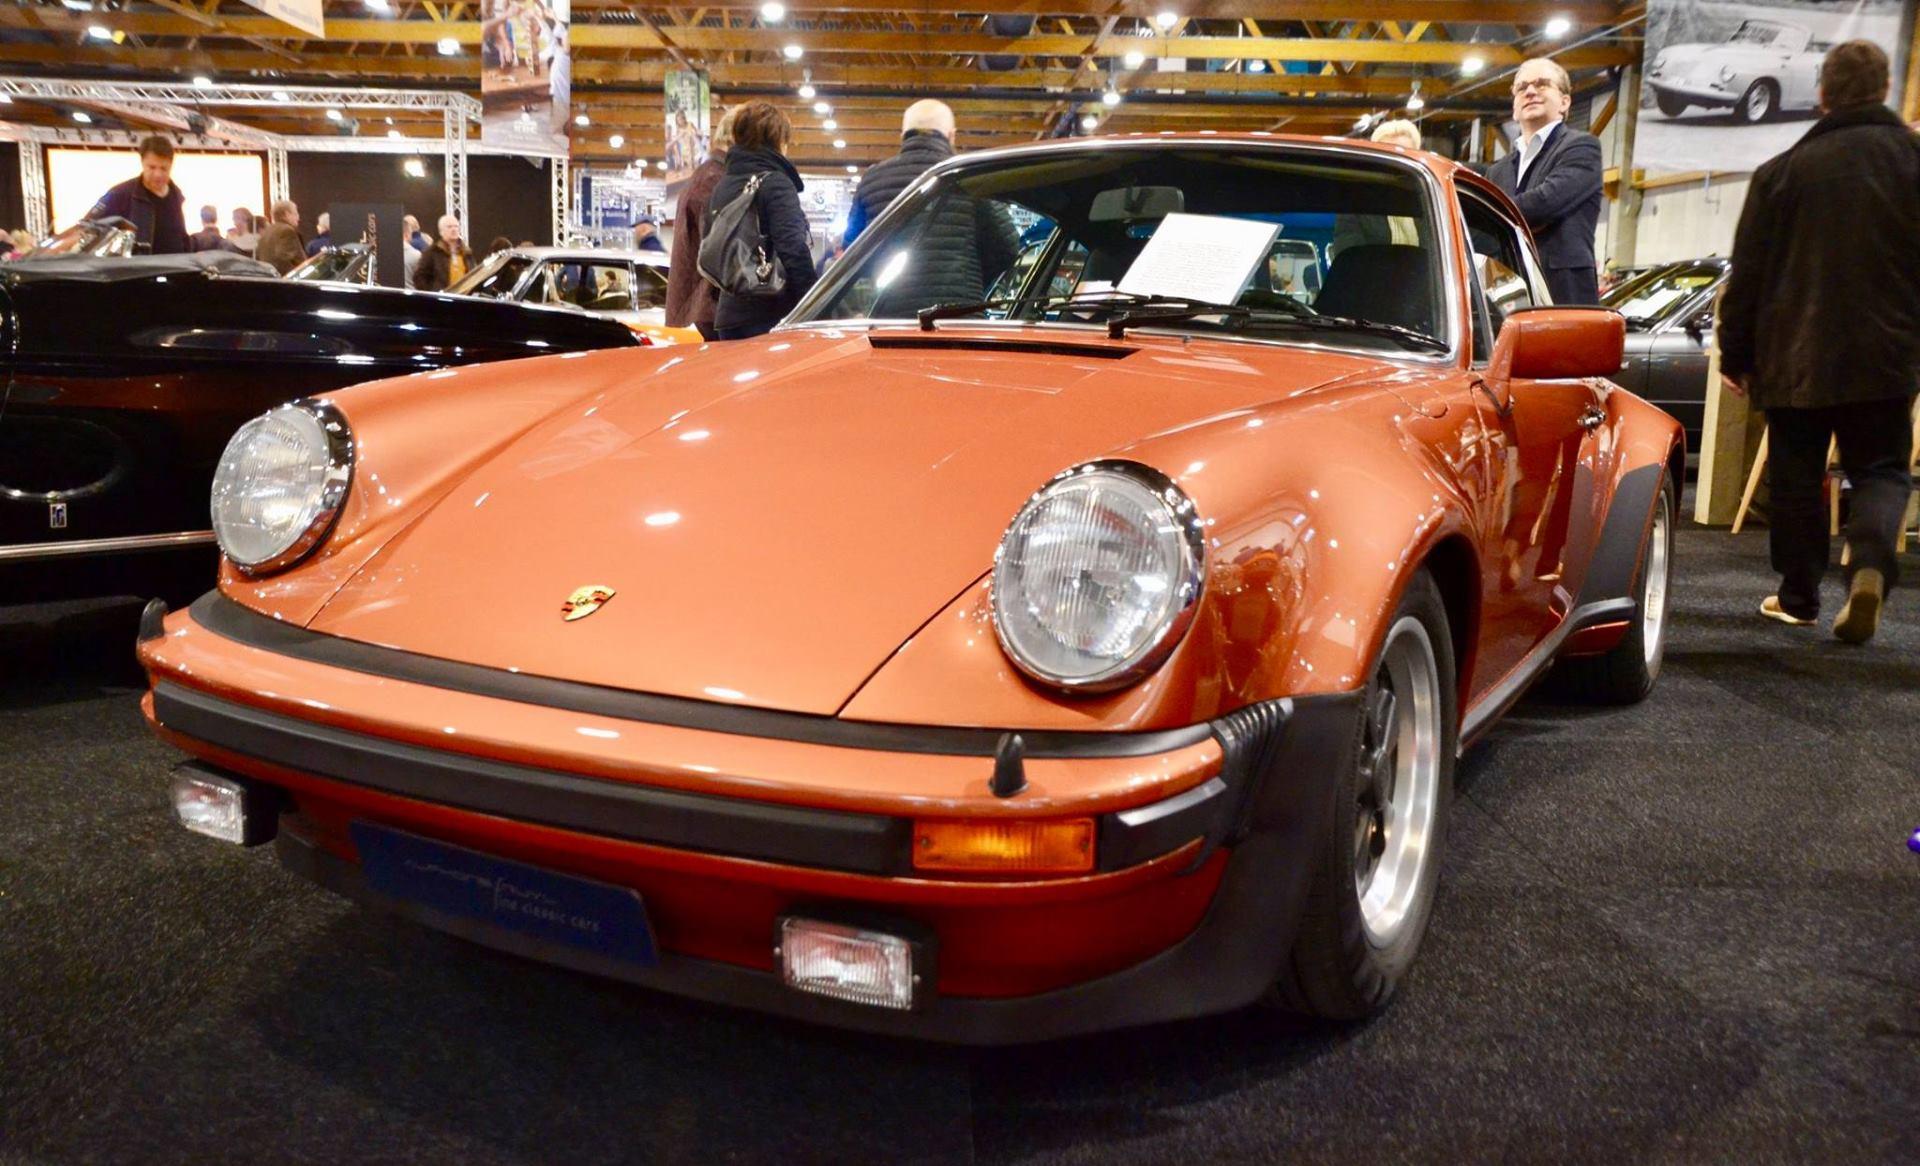 VIDEO: Prošećimo izložbom oldtimer Porsche modela